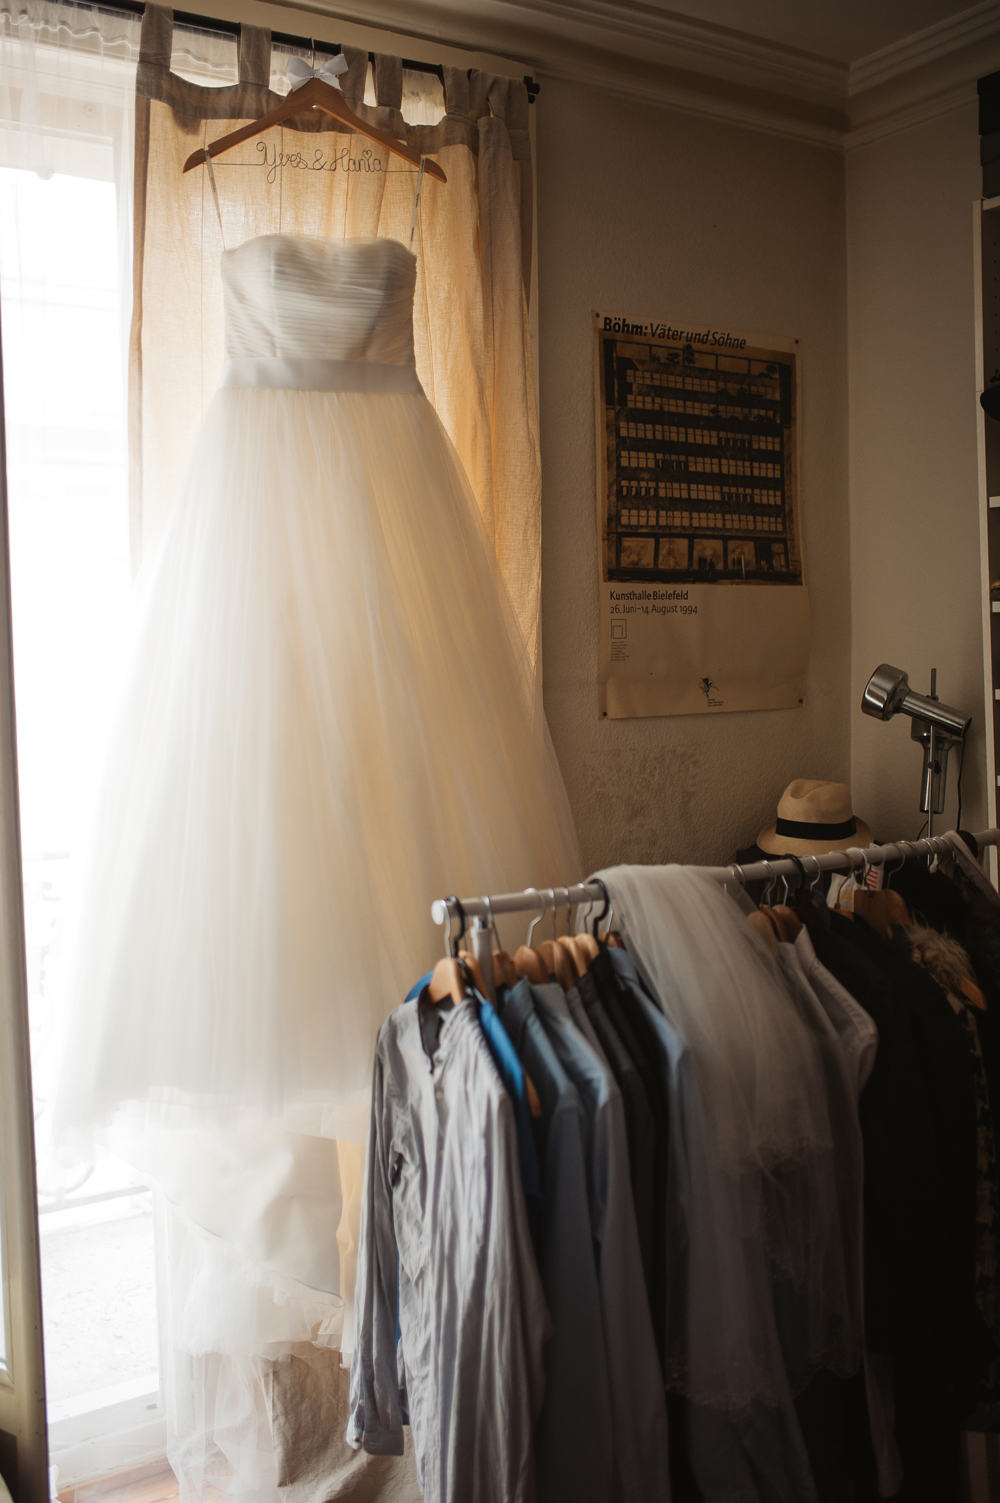 melanie-bultez-photographe-mariage-alternatif-reportage-geneve-147